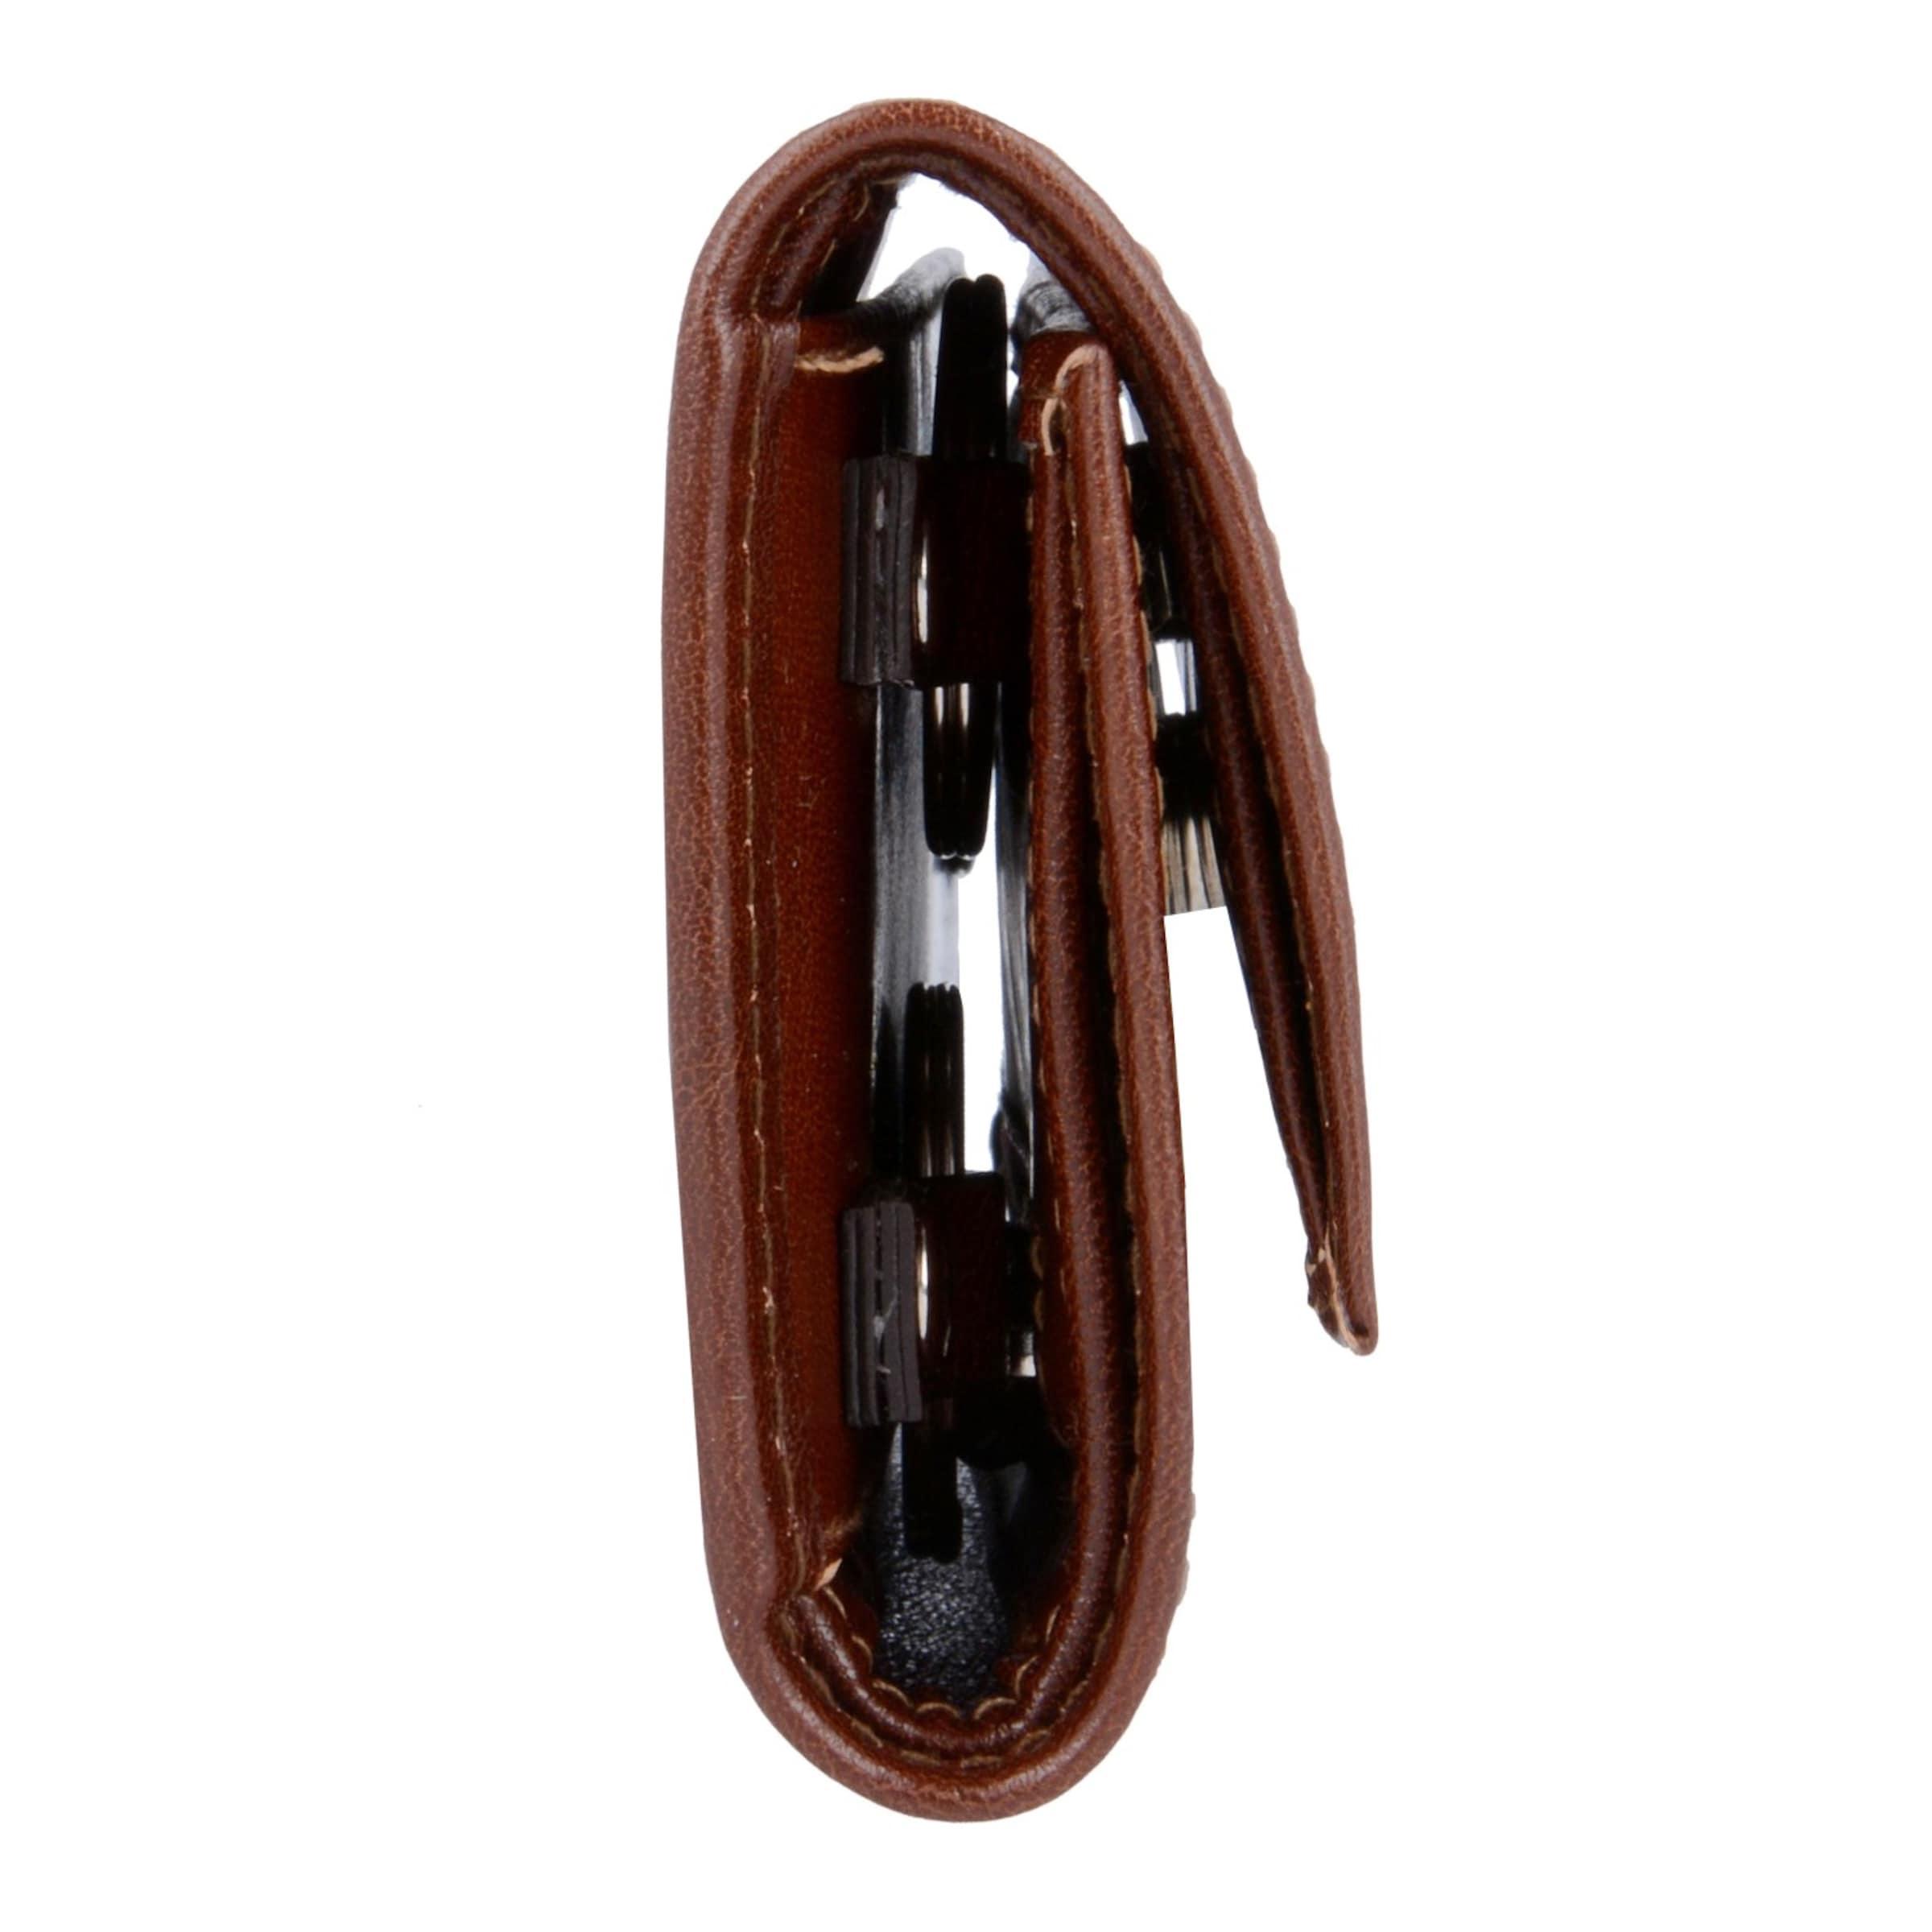 Picard 'Bern' Schlüsseletui Leder 11,5 cm